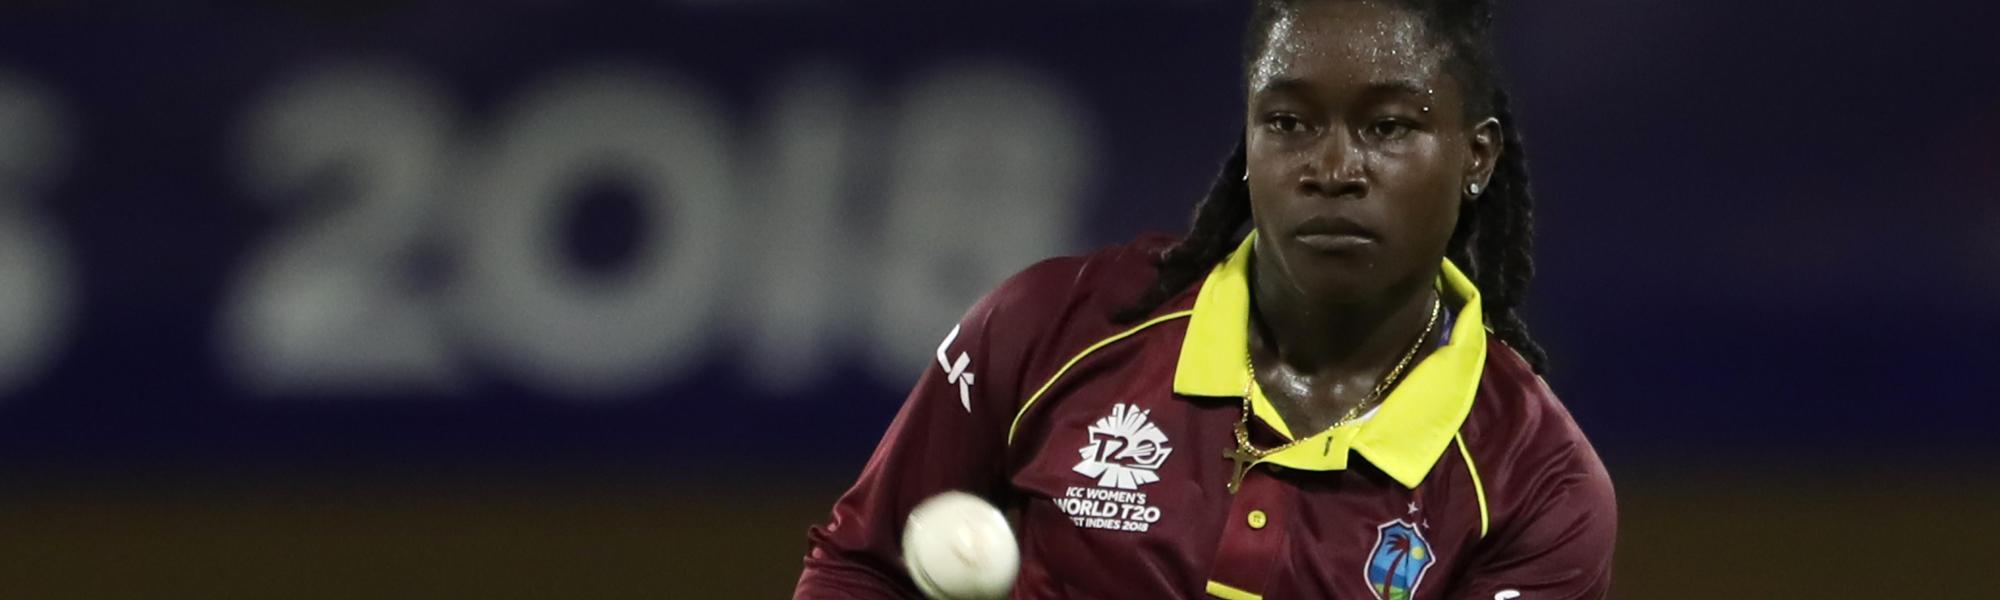 Deandra Dottin of the Windies during match 3, Windies Women v Bangladesh Women on November 9, 2018 in Providence, Guyana.